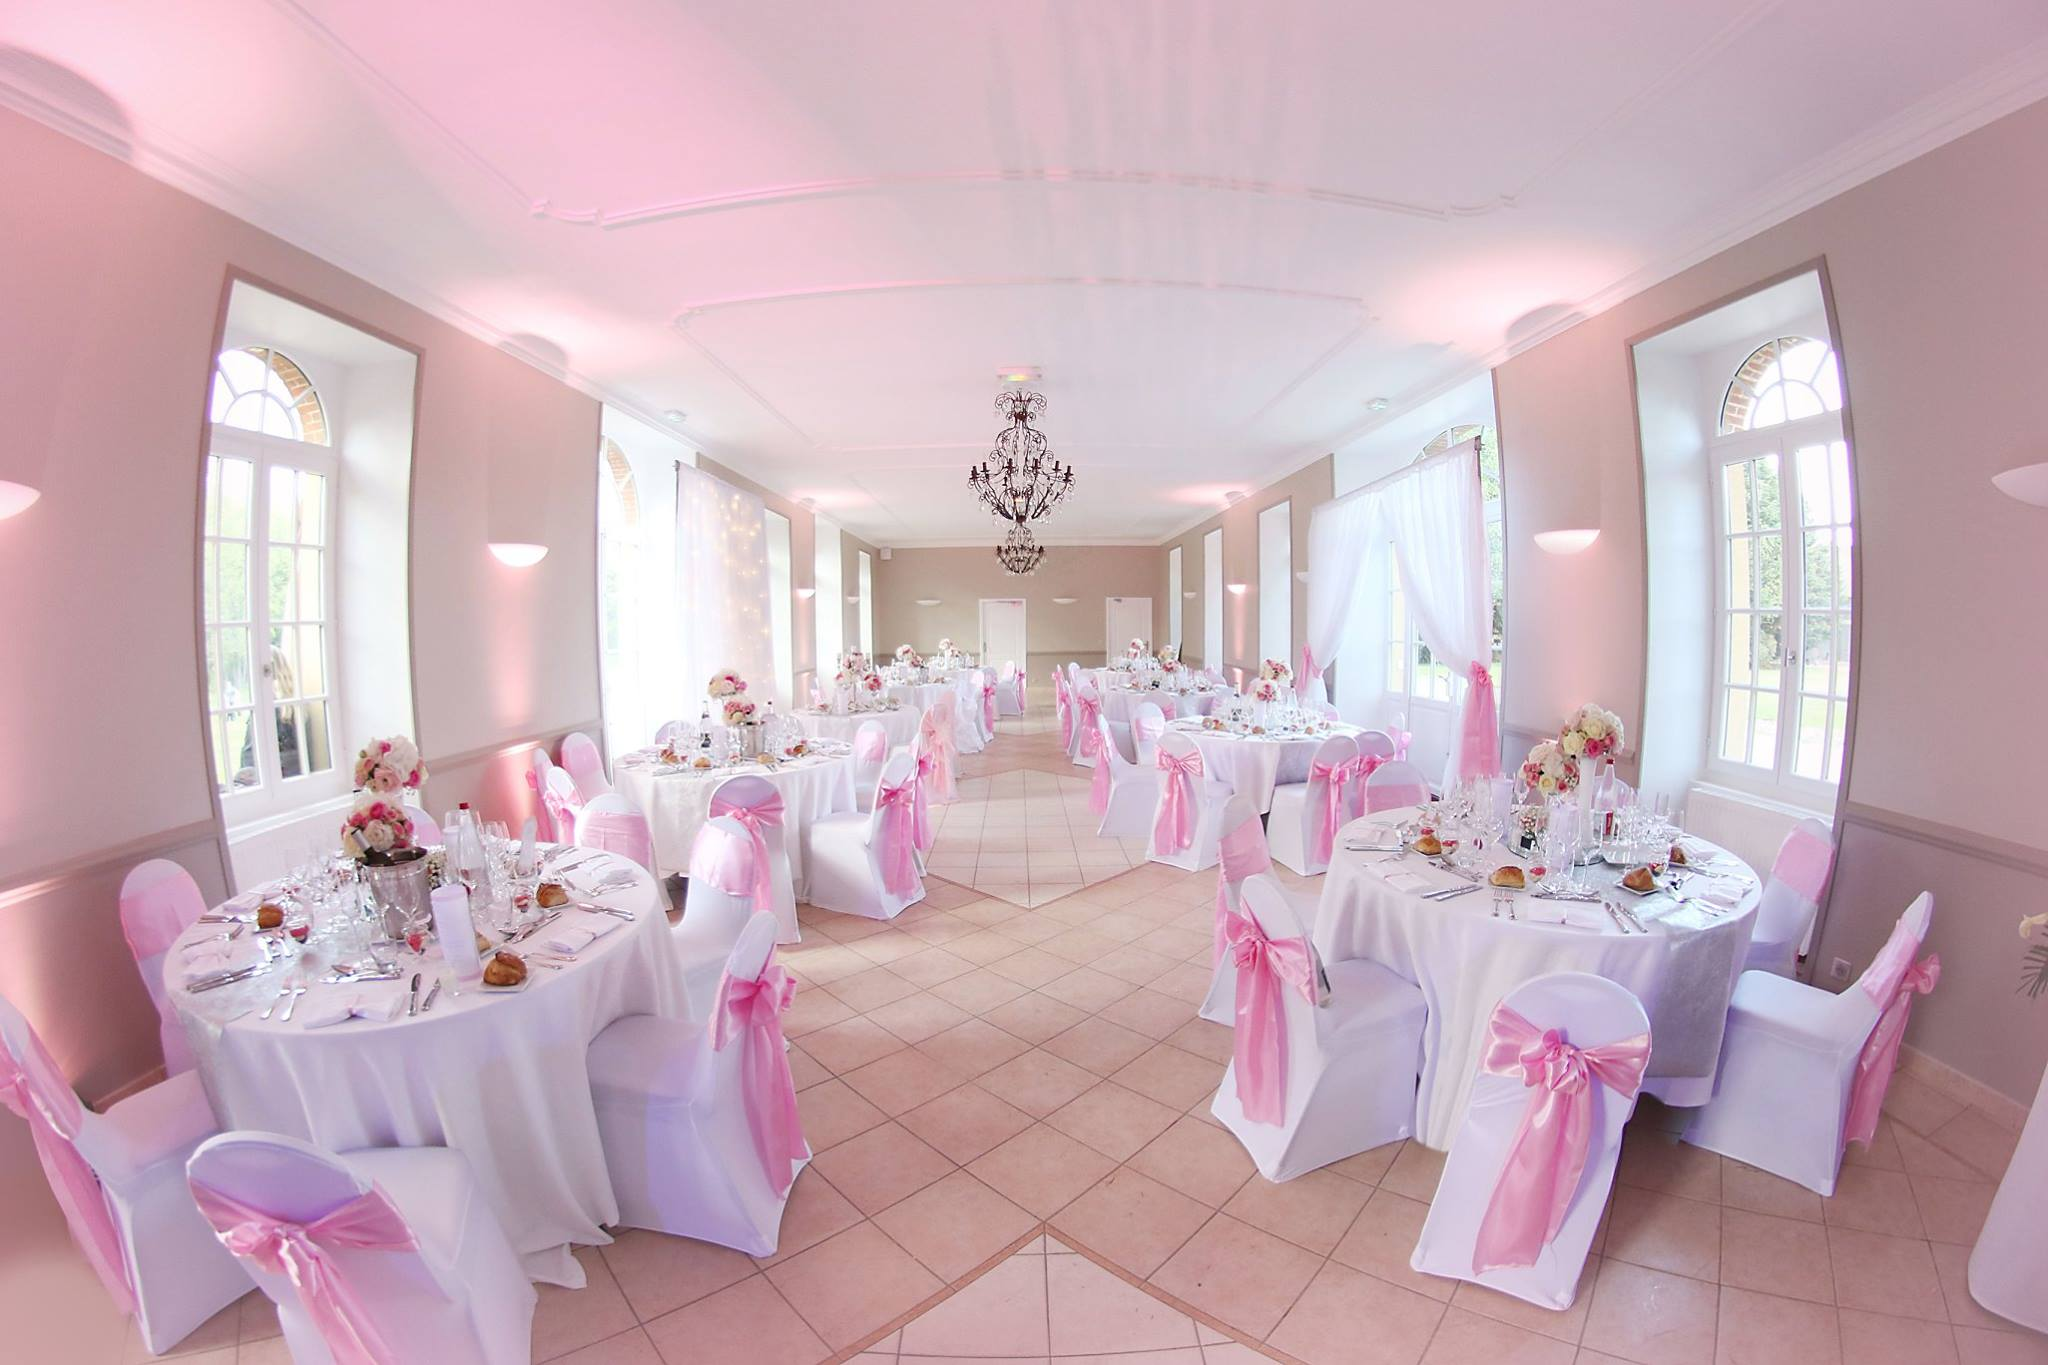 decoration salle mariage - Natagency